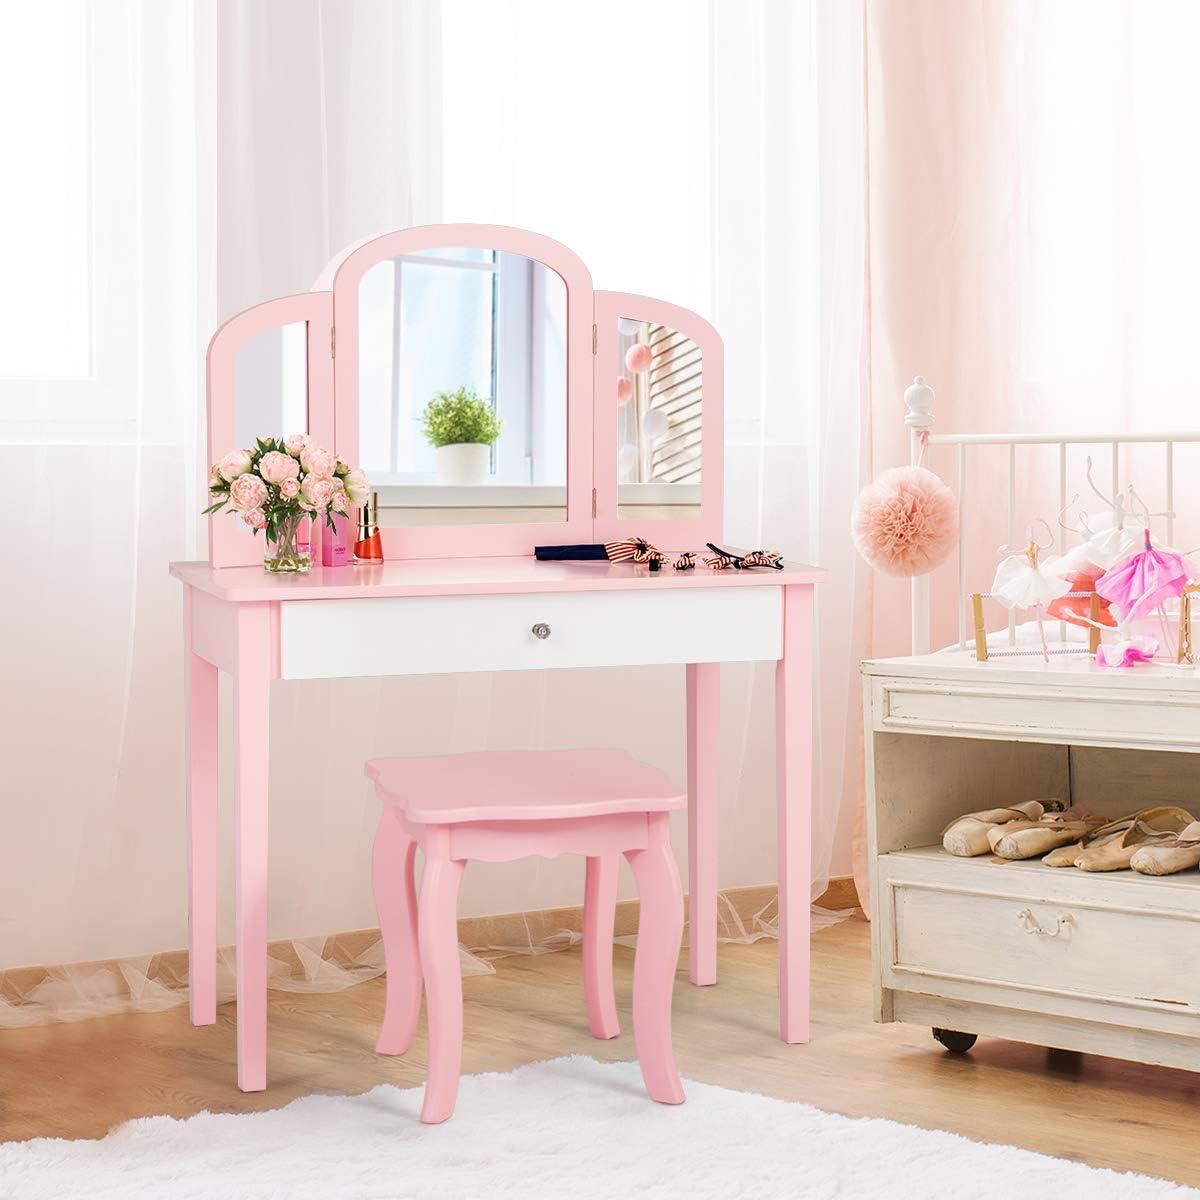 Fireflowery Kids Vanity depot Table and Wooden Ranking TOP13 Princess Set Chair Mak